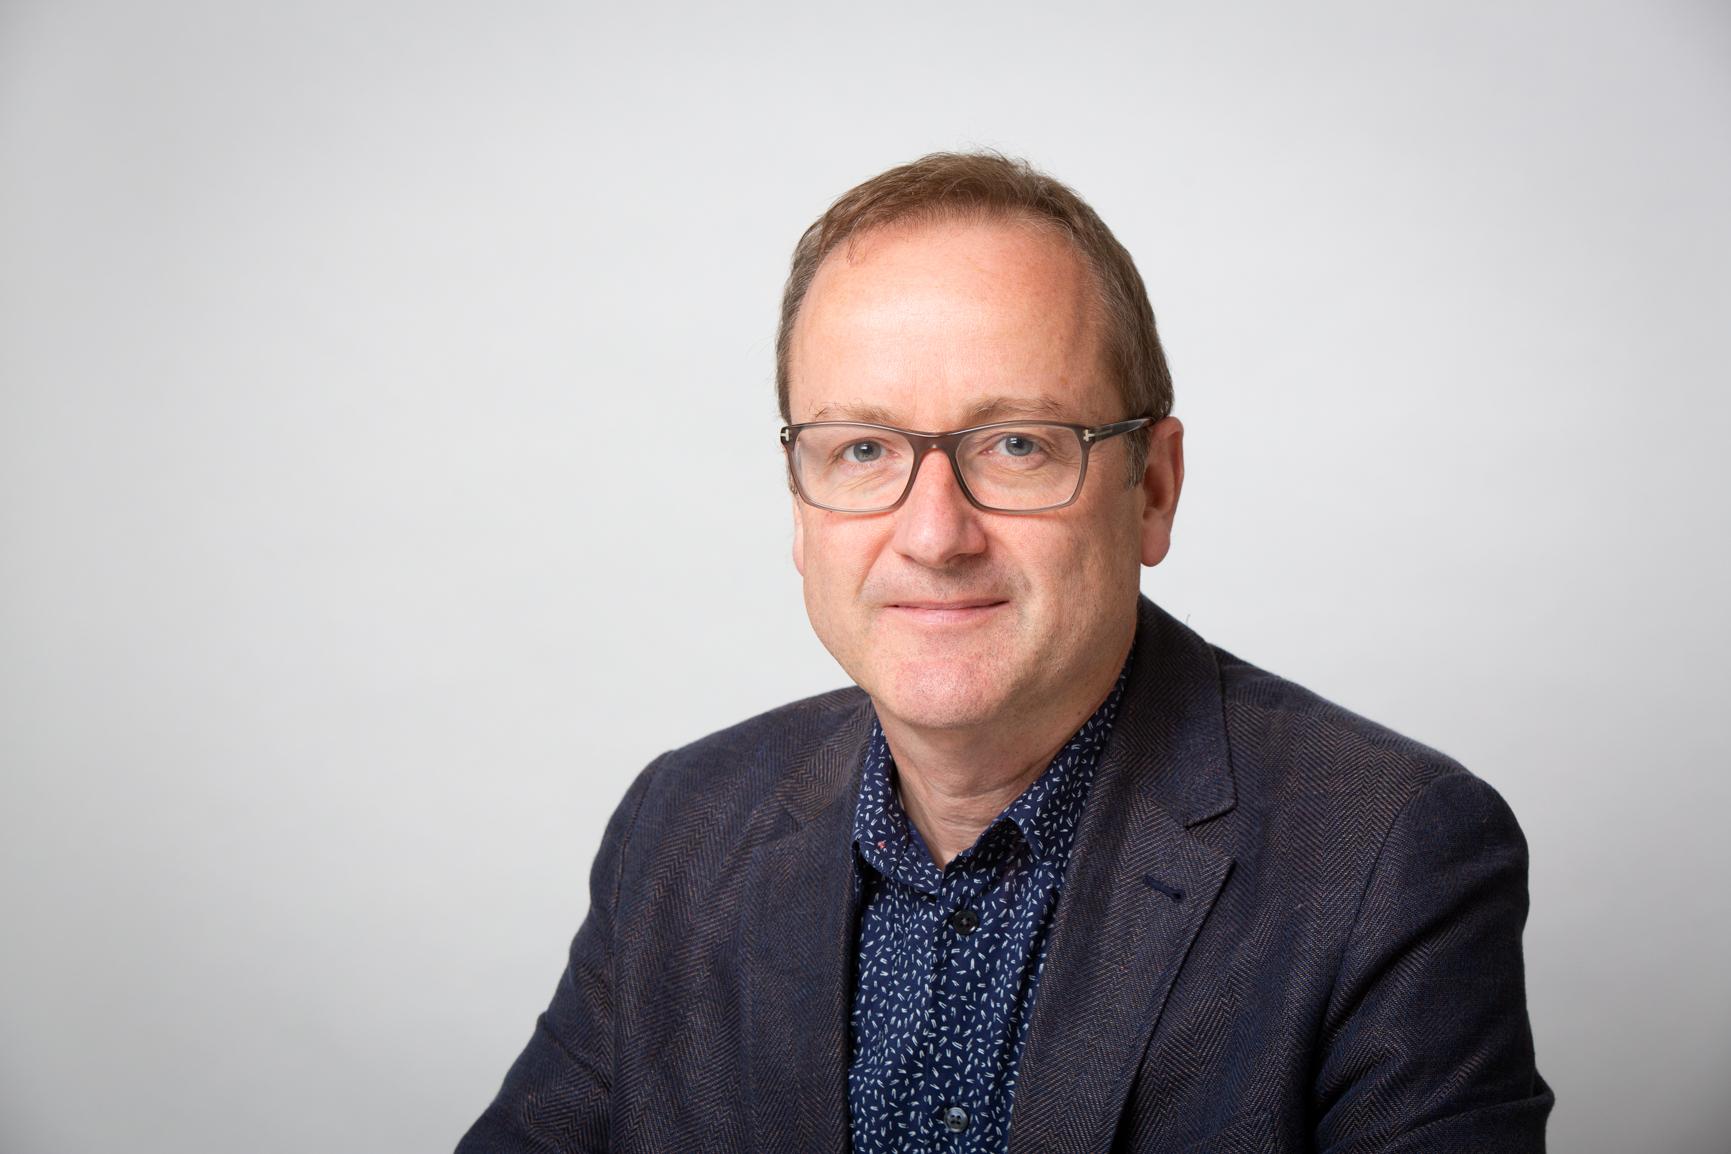 Professor Richard Moorhead